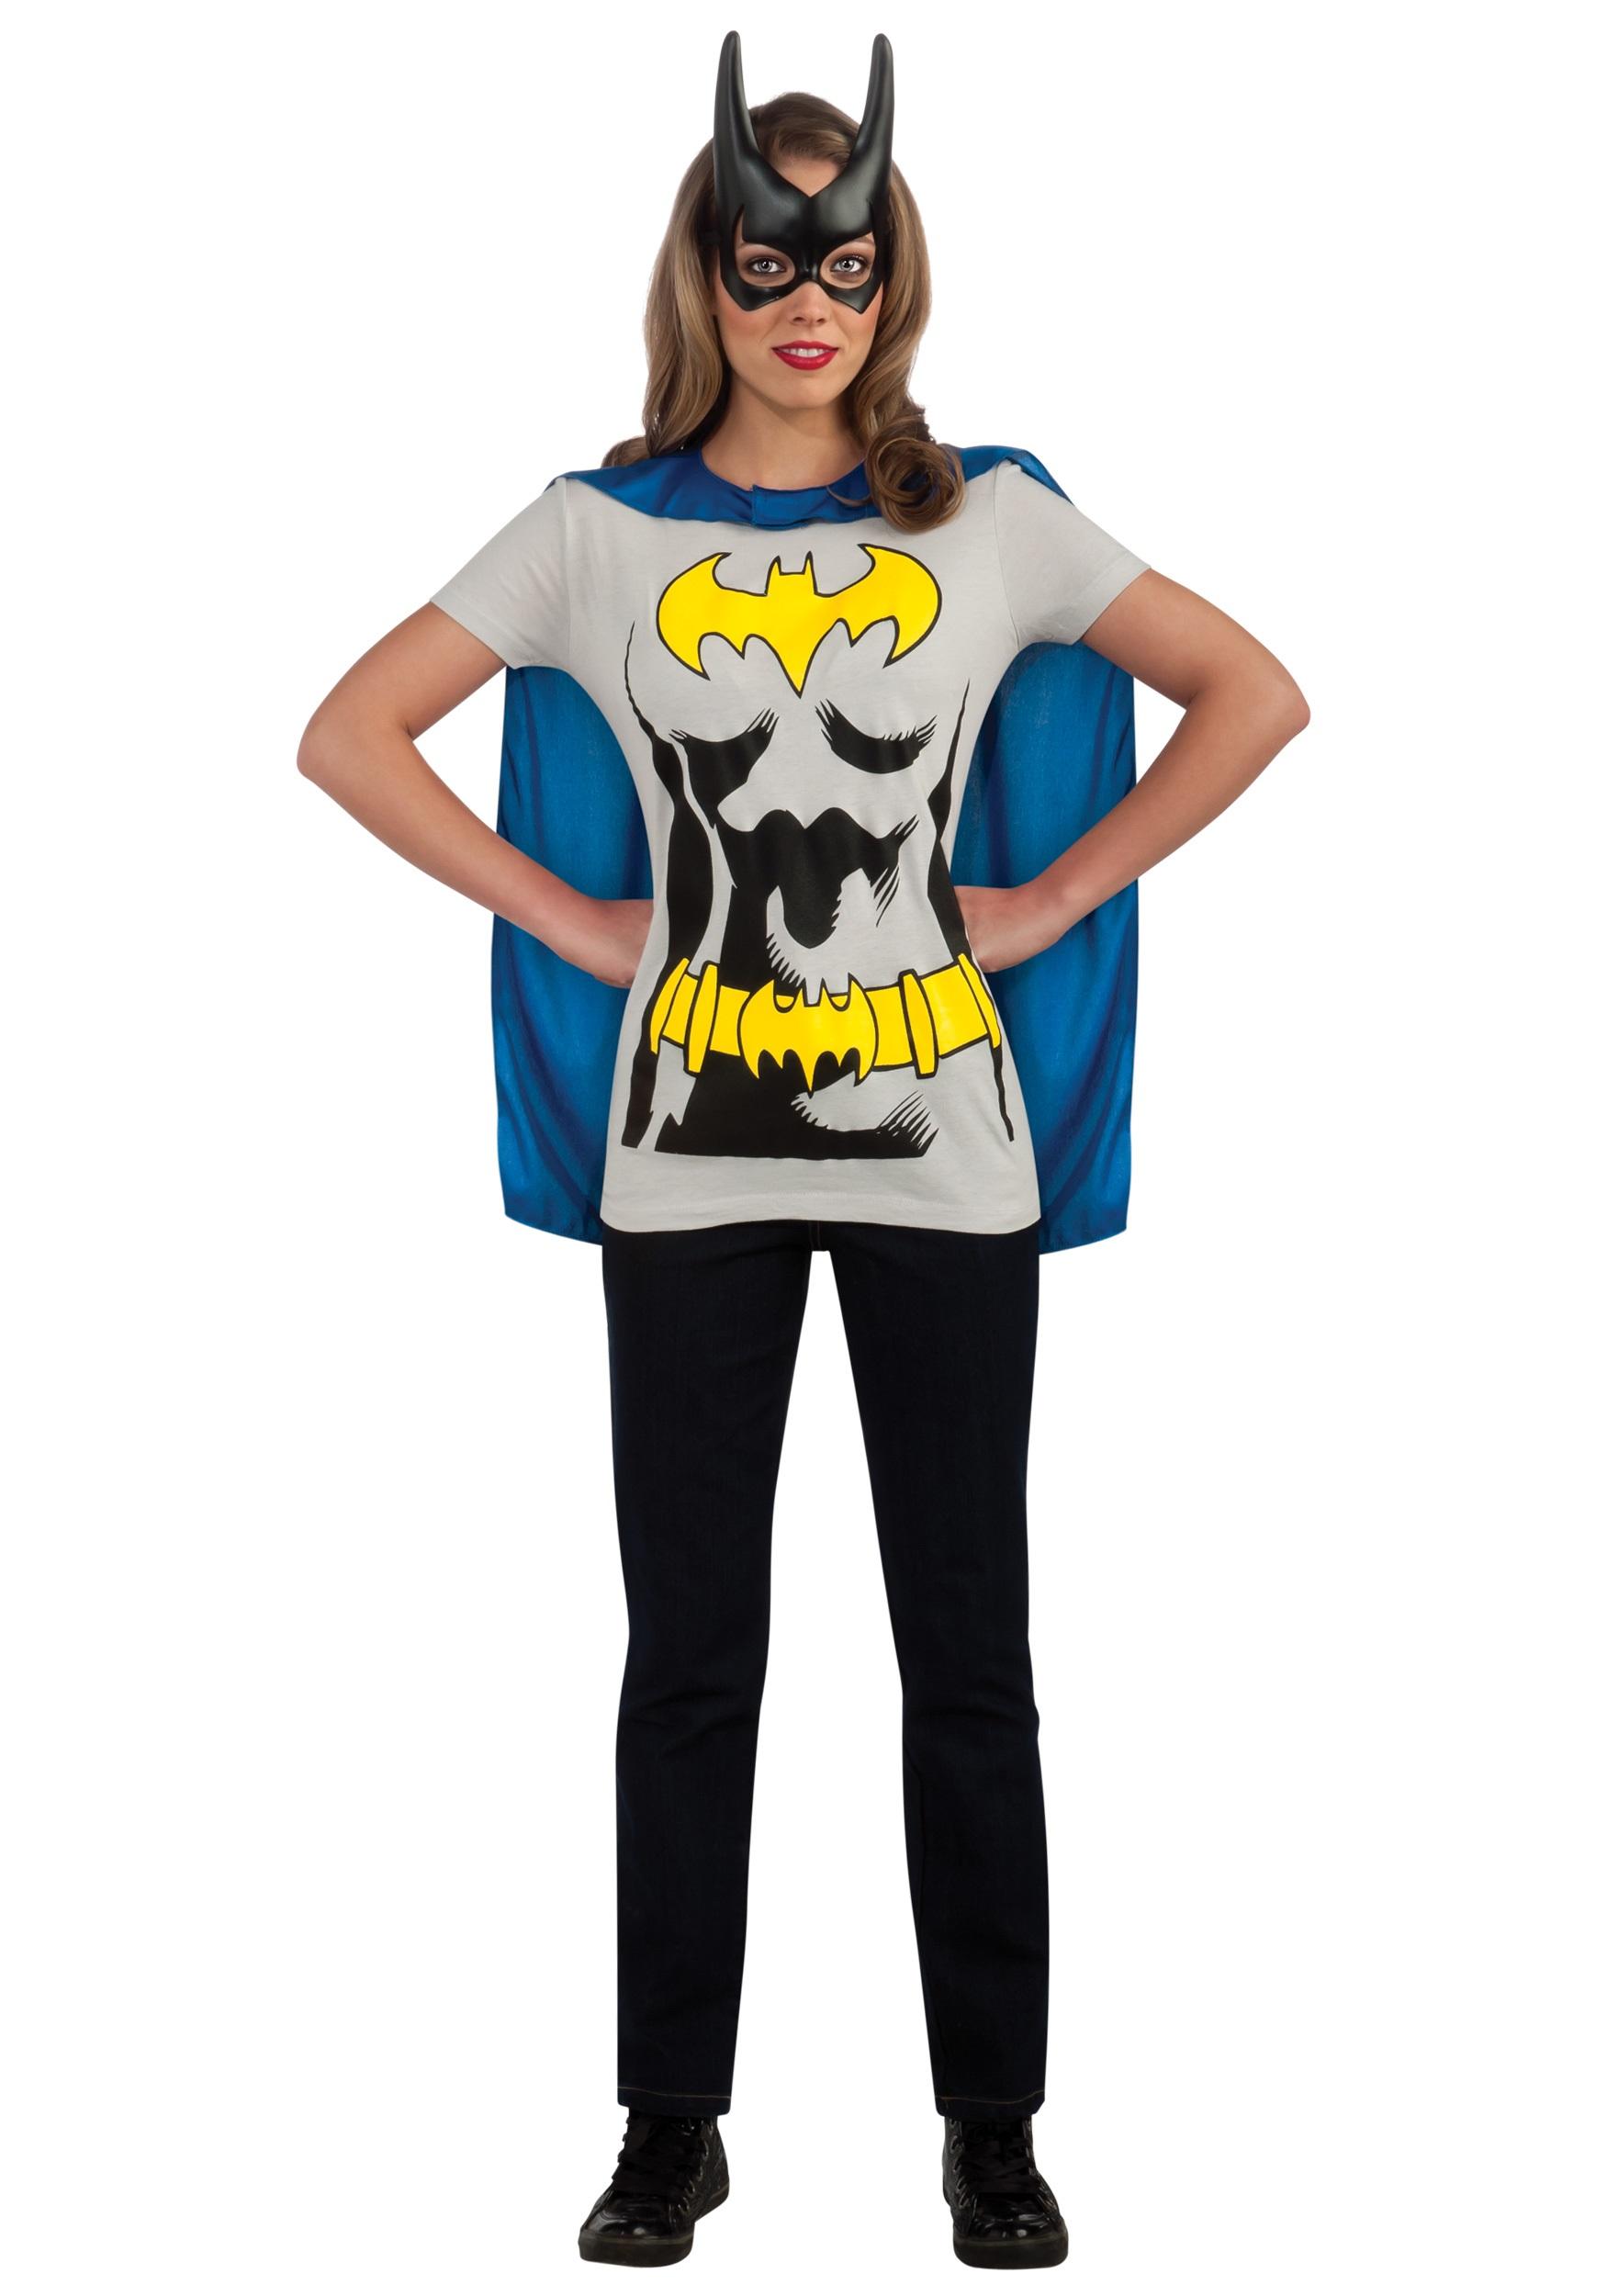 C956 Superhero T-Shirt Women Costume Wonder Woman Robin Supergirl Batgirl /& Cape